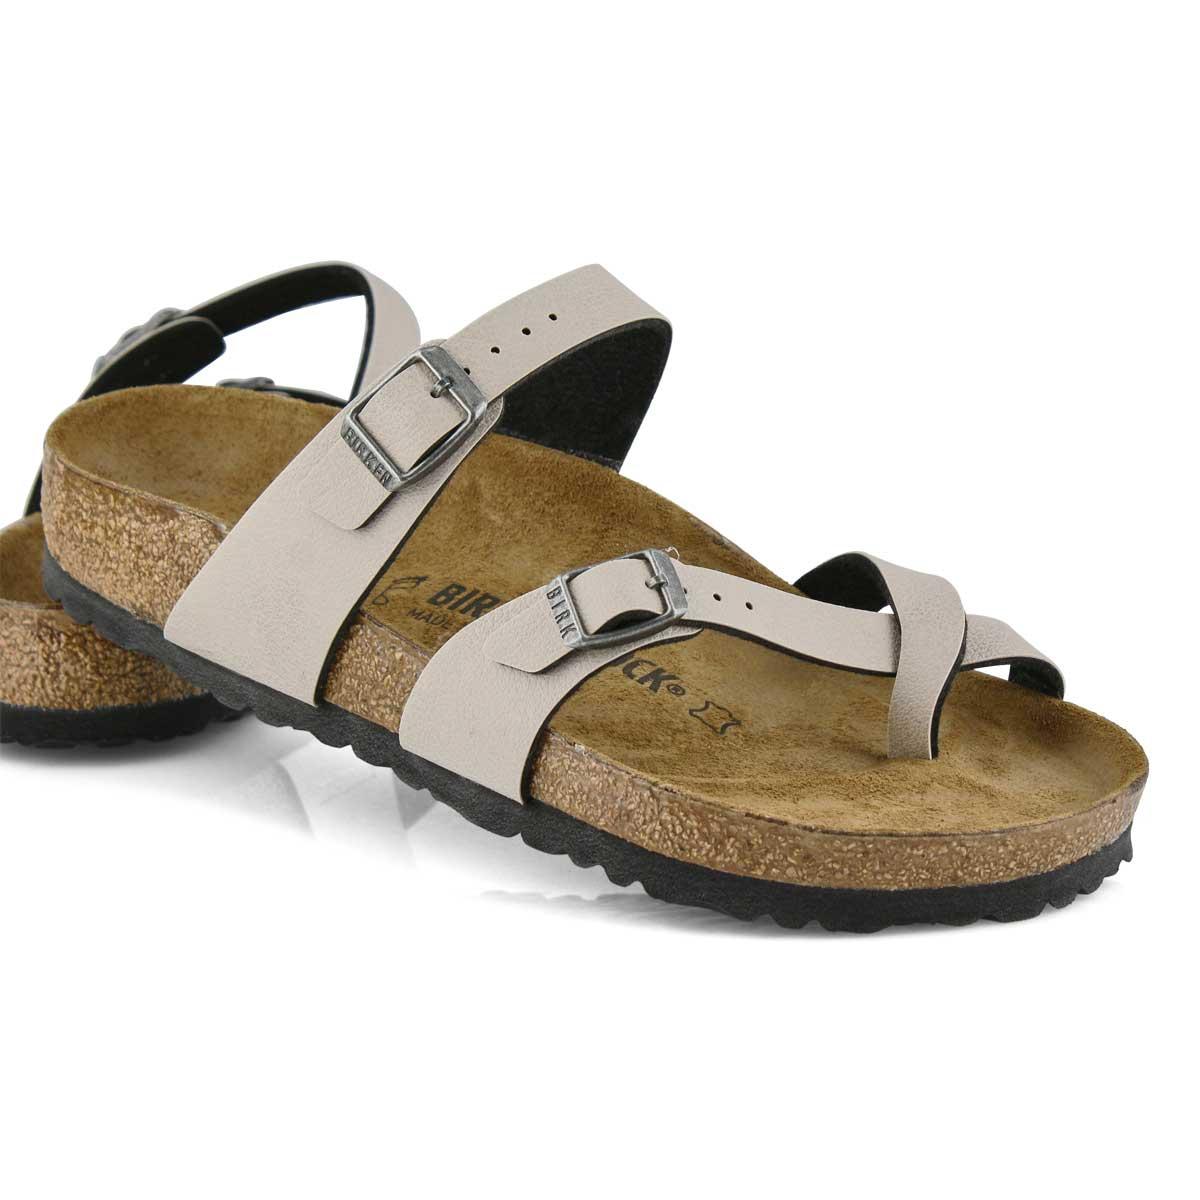 Sandale BF Mayari, pierre, fem